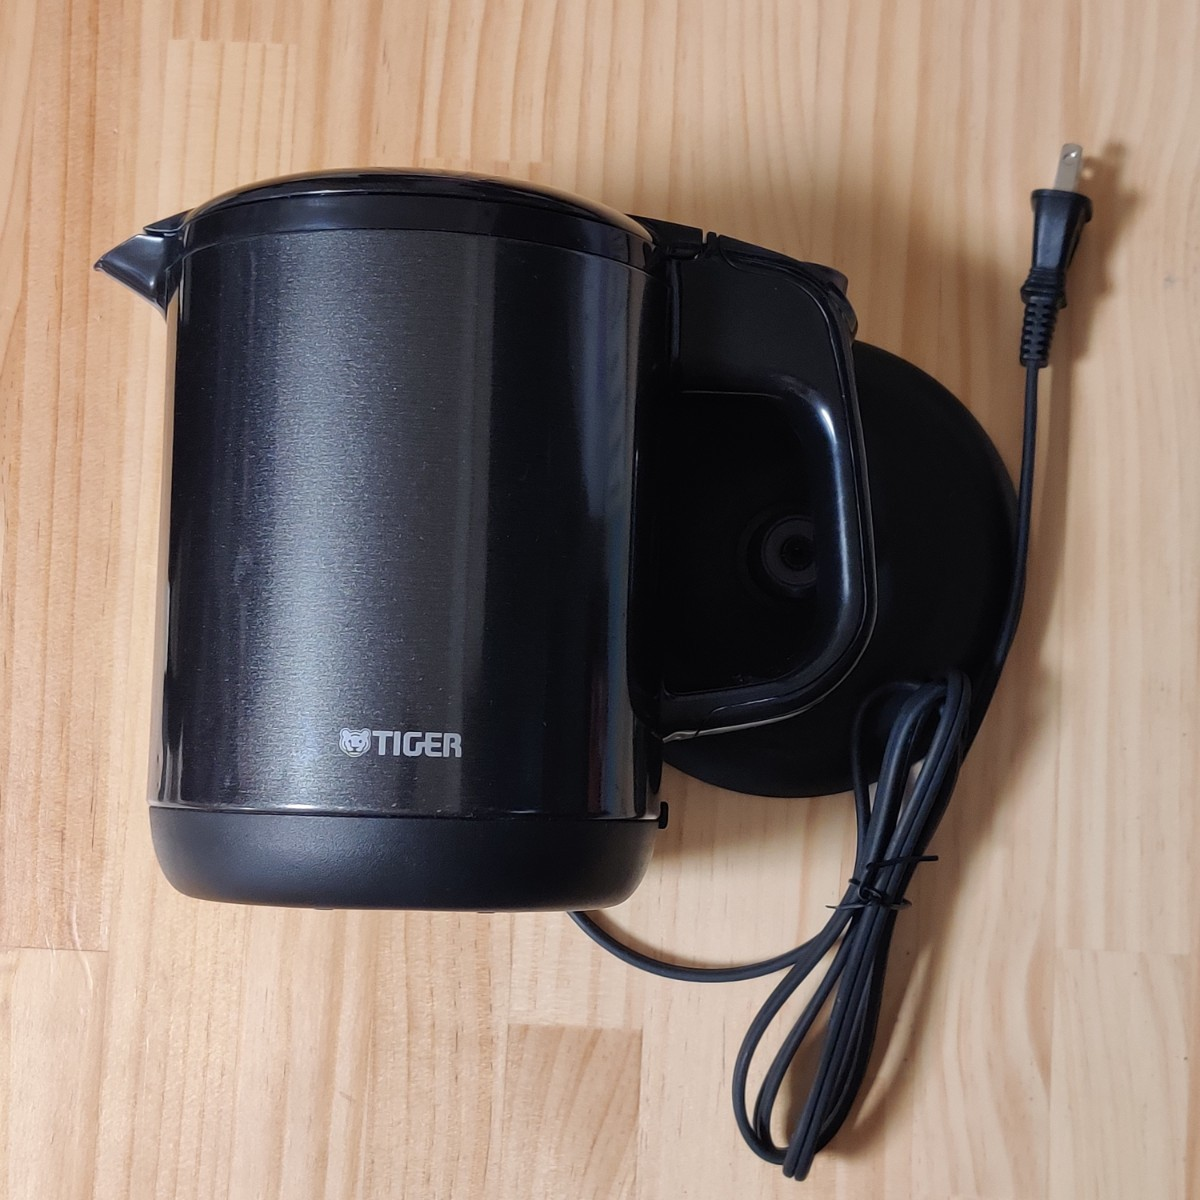 Tiger PCG-G080 蒸気レス 電気ケトル